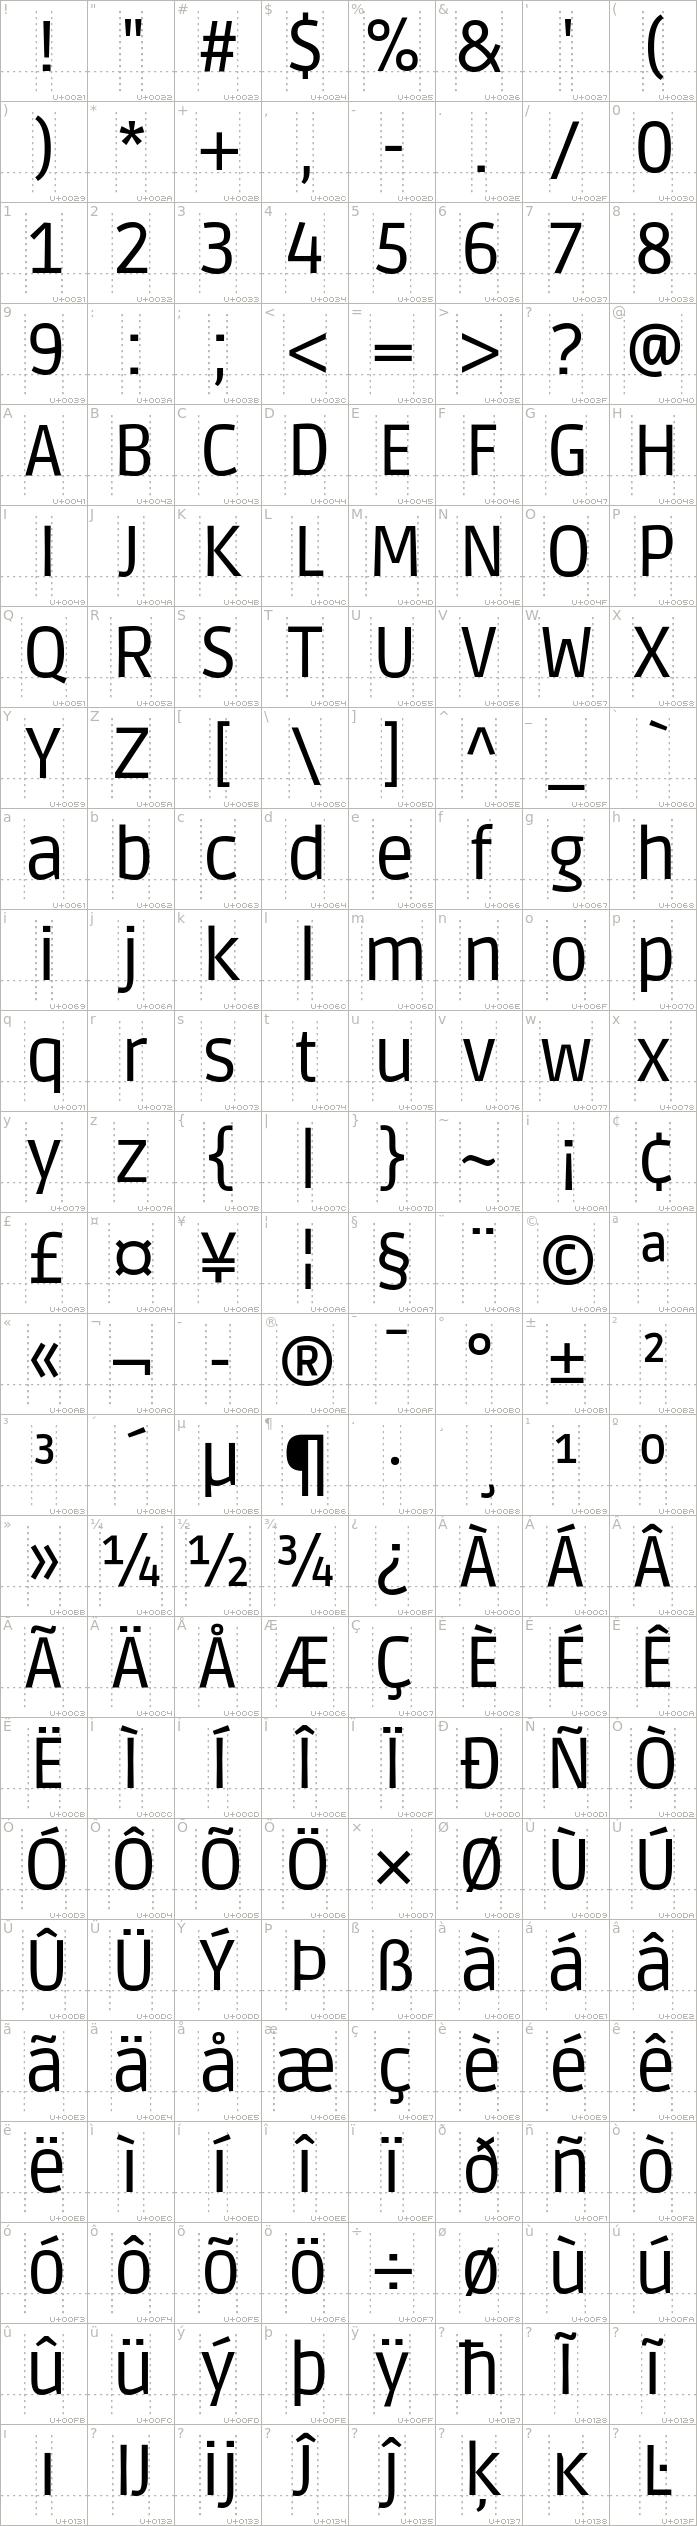 ruda.regular.character-map-1